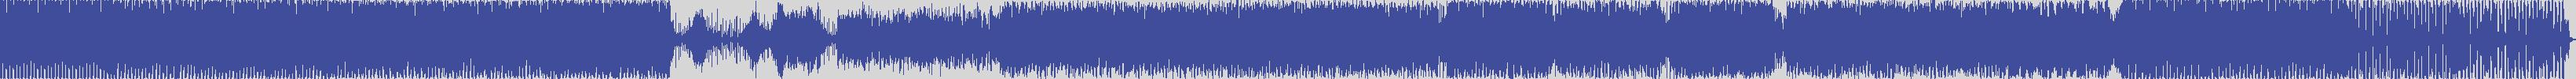 just_digital_records [JS1143] Homeboyz - Crazy Dj [Rh & Thunder Dj Crazy S-mix] audio wave form